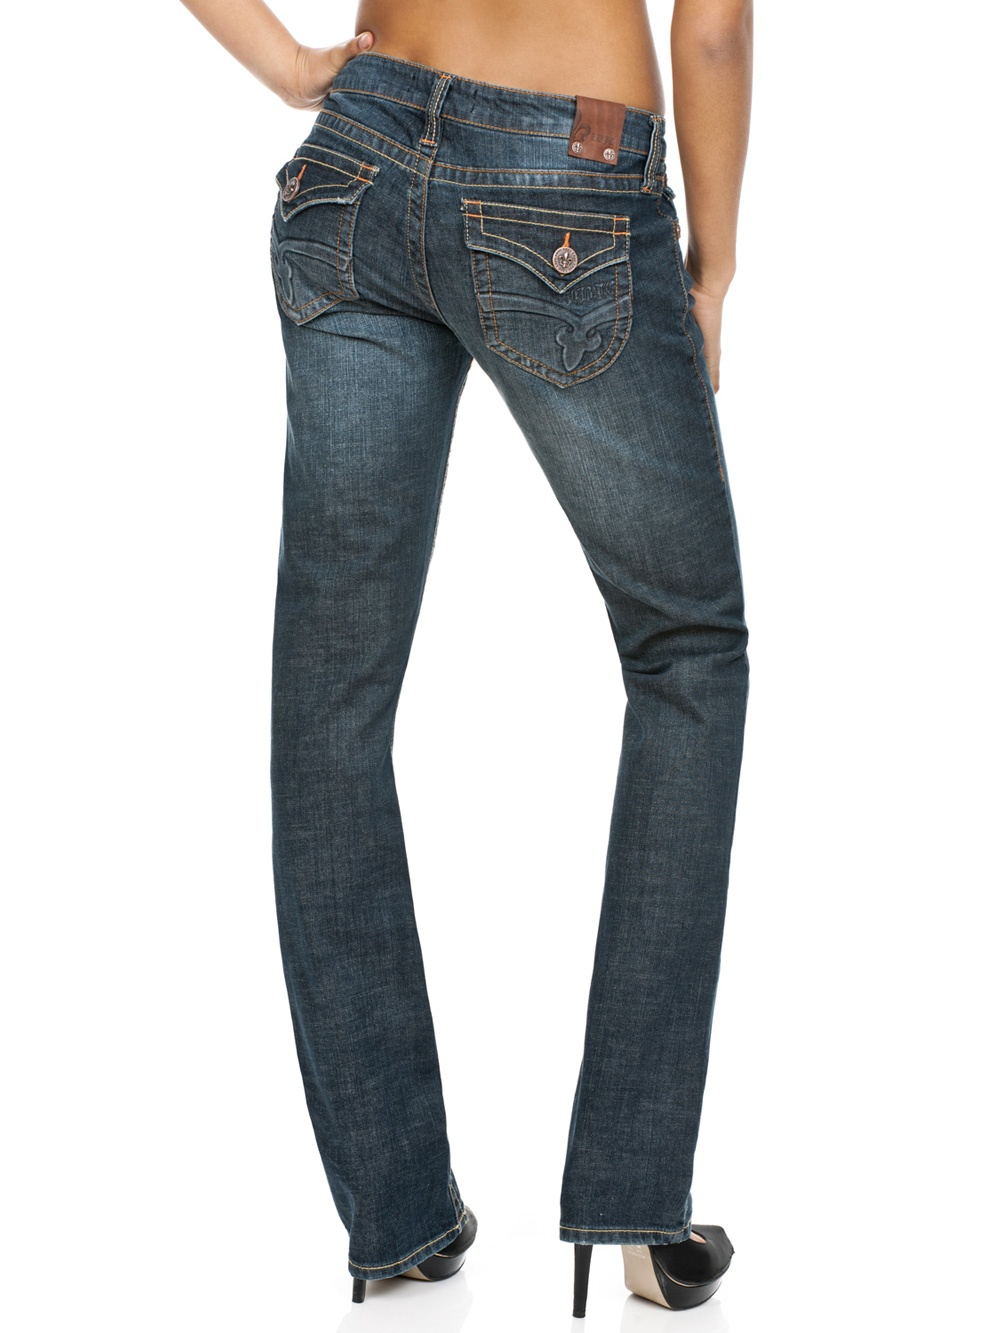 laguna beach jeans damen jeans crystal cove laguna beach jeans 6212 jeans g nstig online. Black Bedroom Furniture Sets. Home Design Ideas